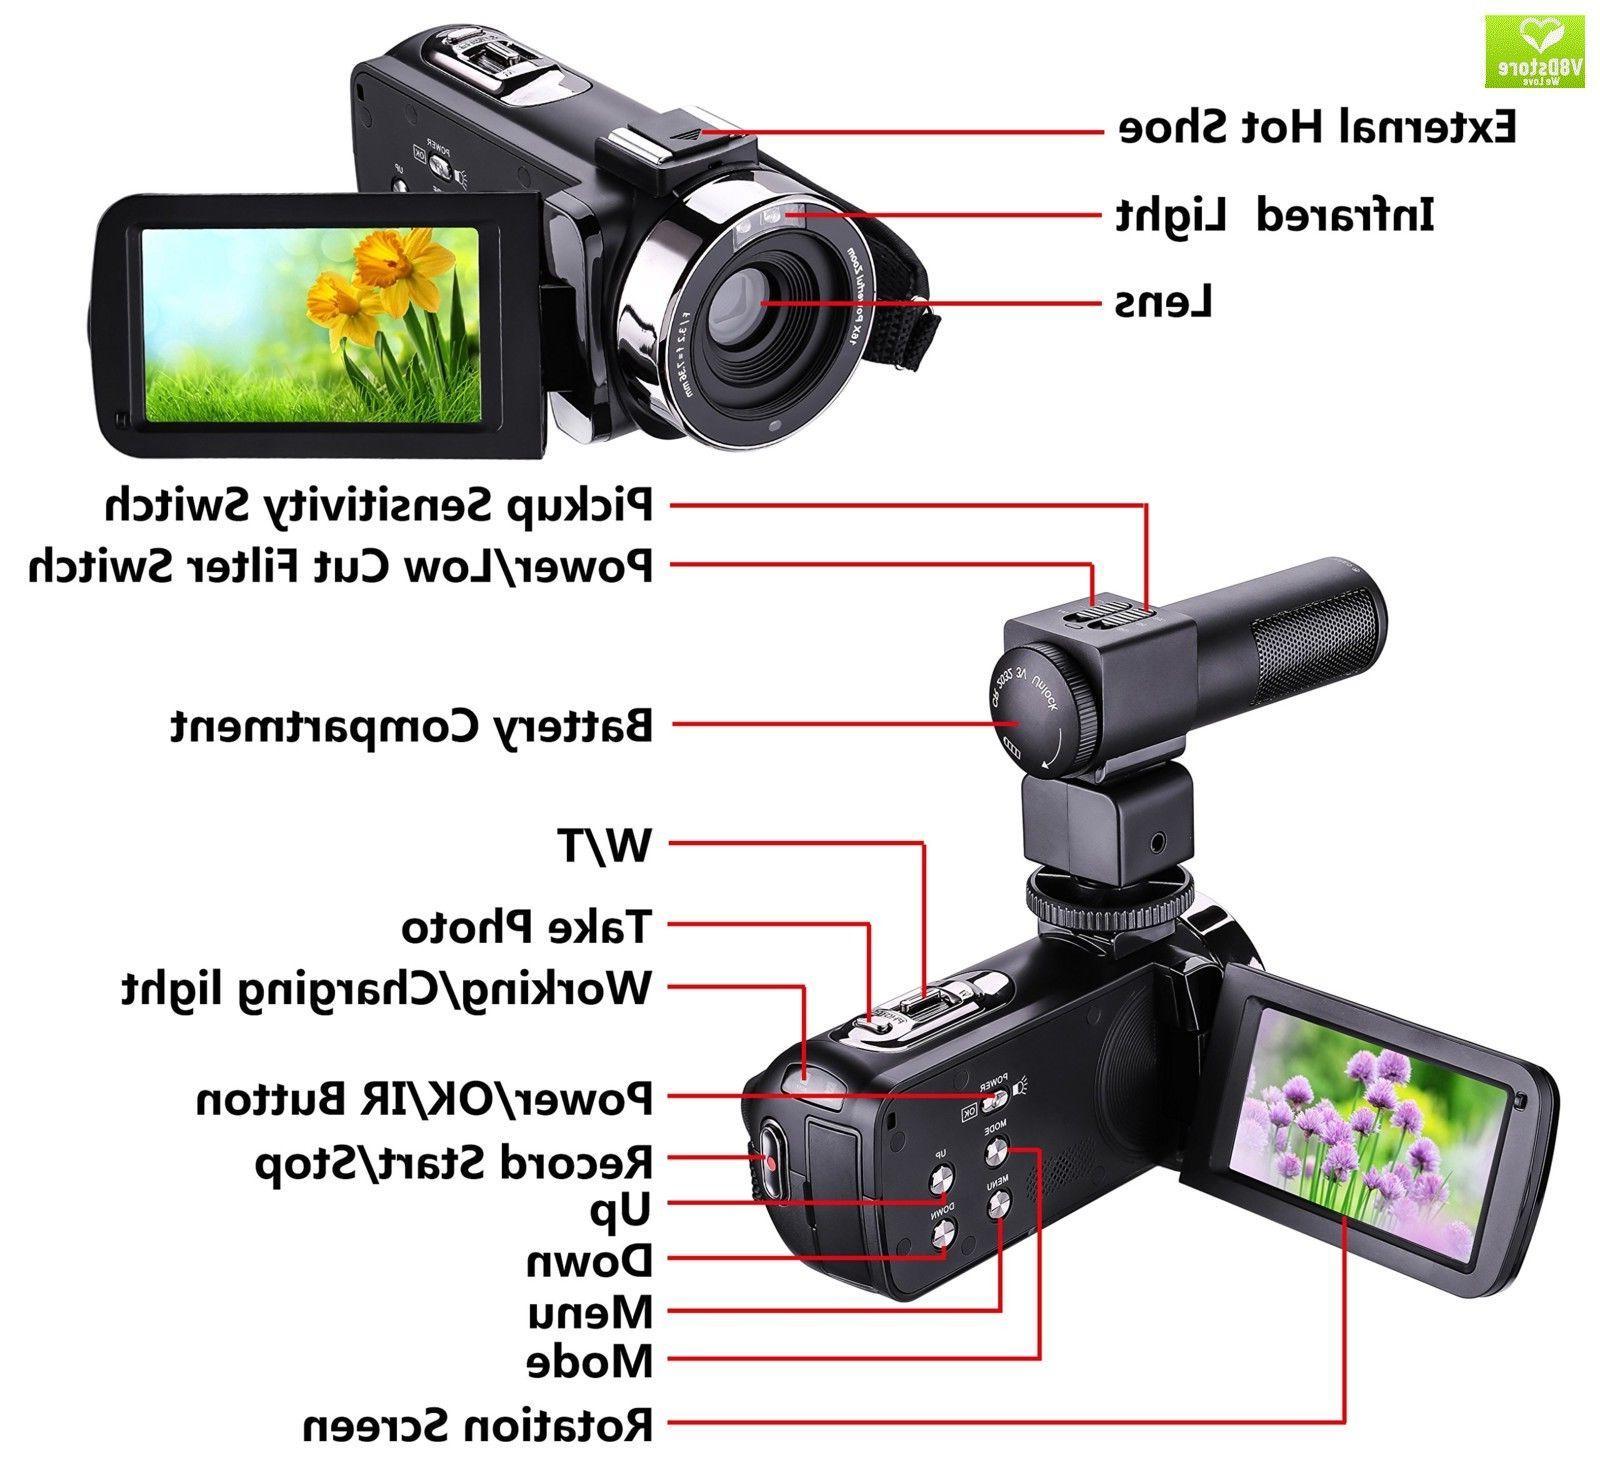 camera camcorder remote control infrared night vision